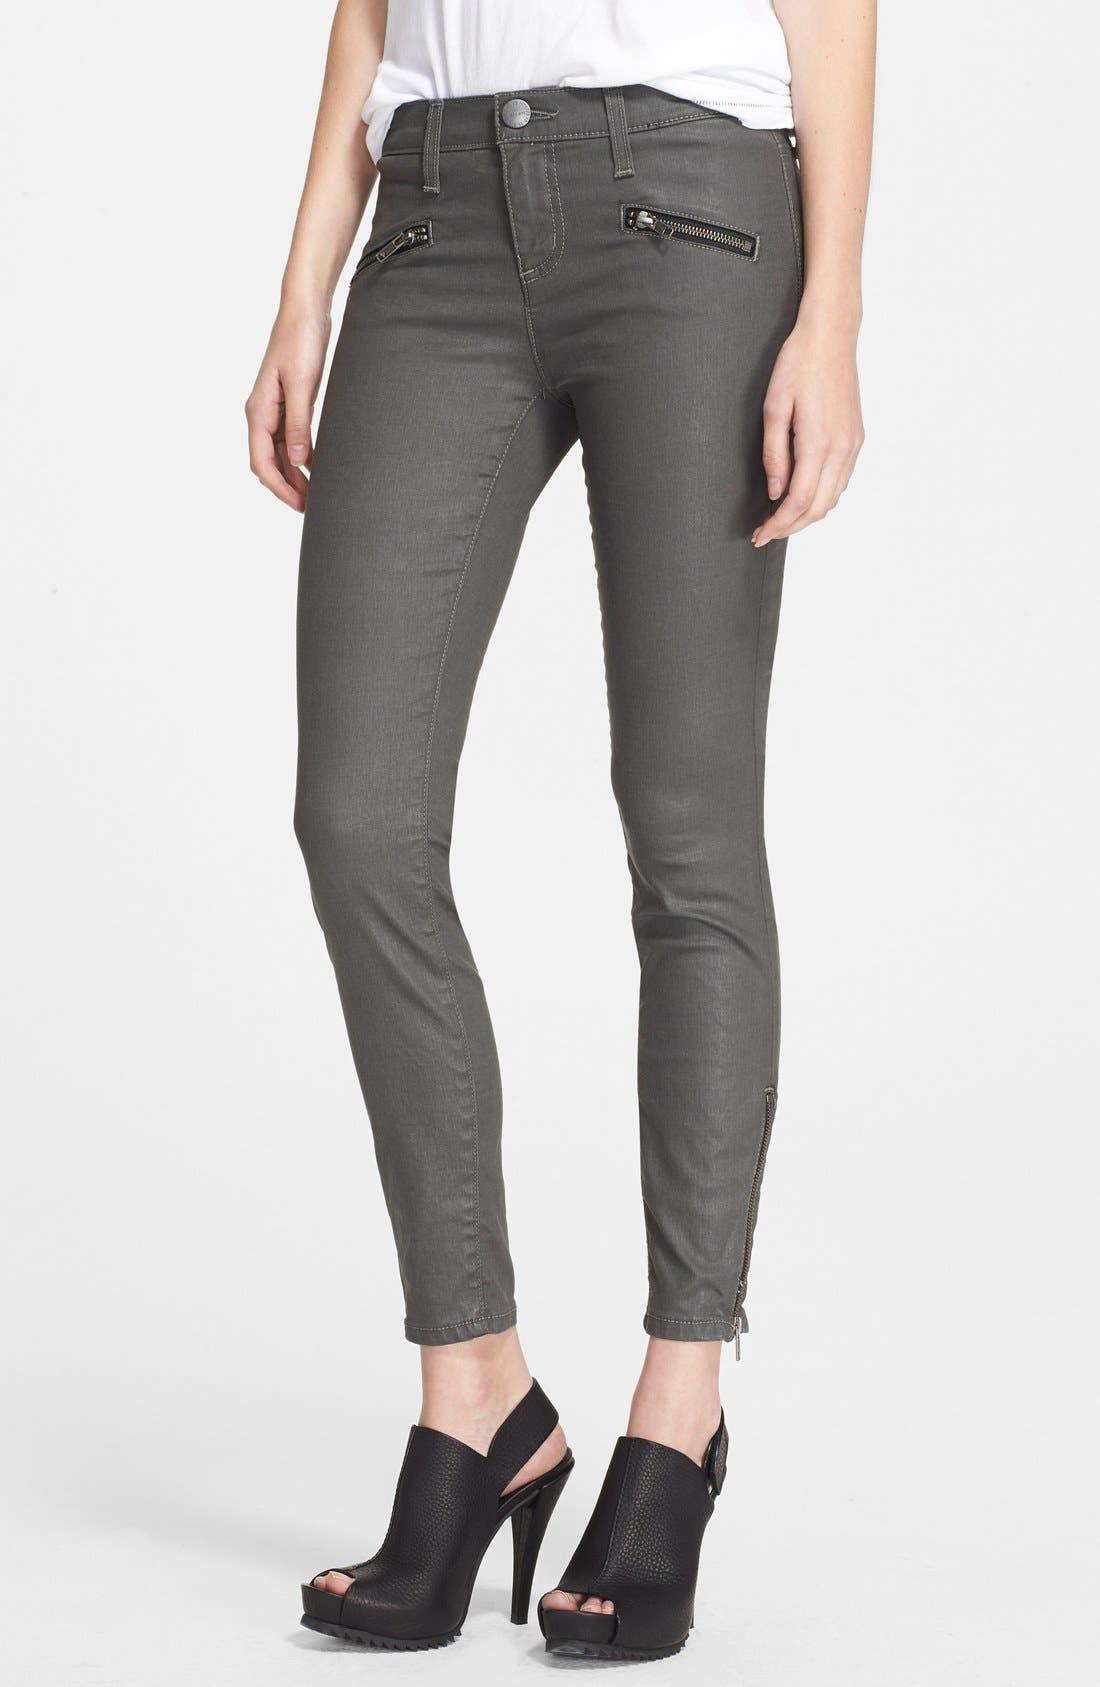 Main Image - Current/Elliott 'The Soho Zip' Skinny Jeans (Castle Coated)